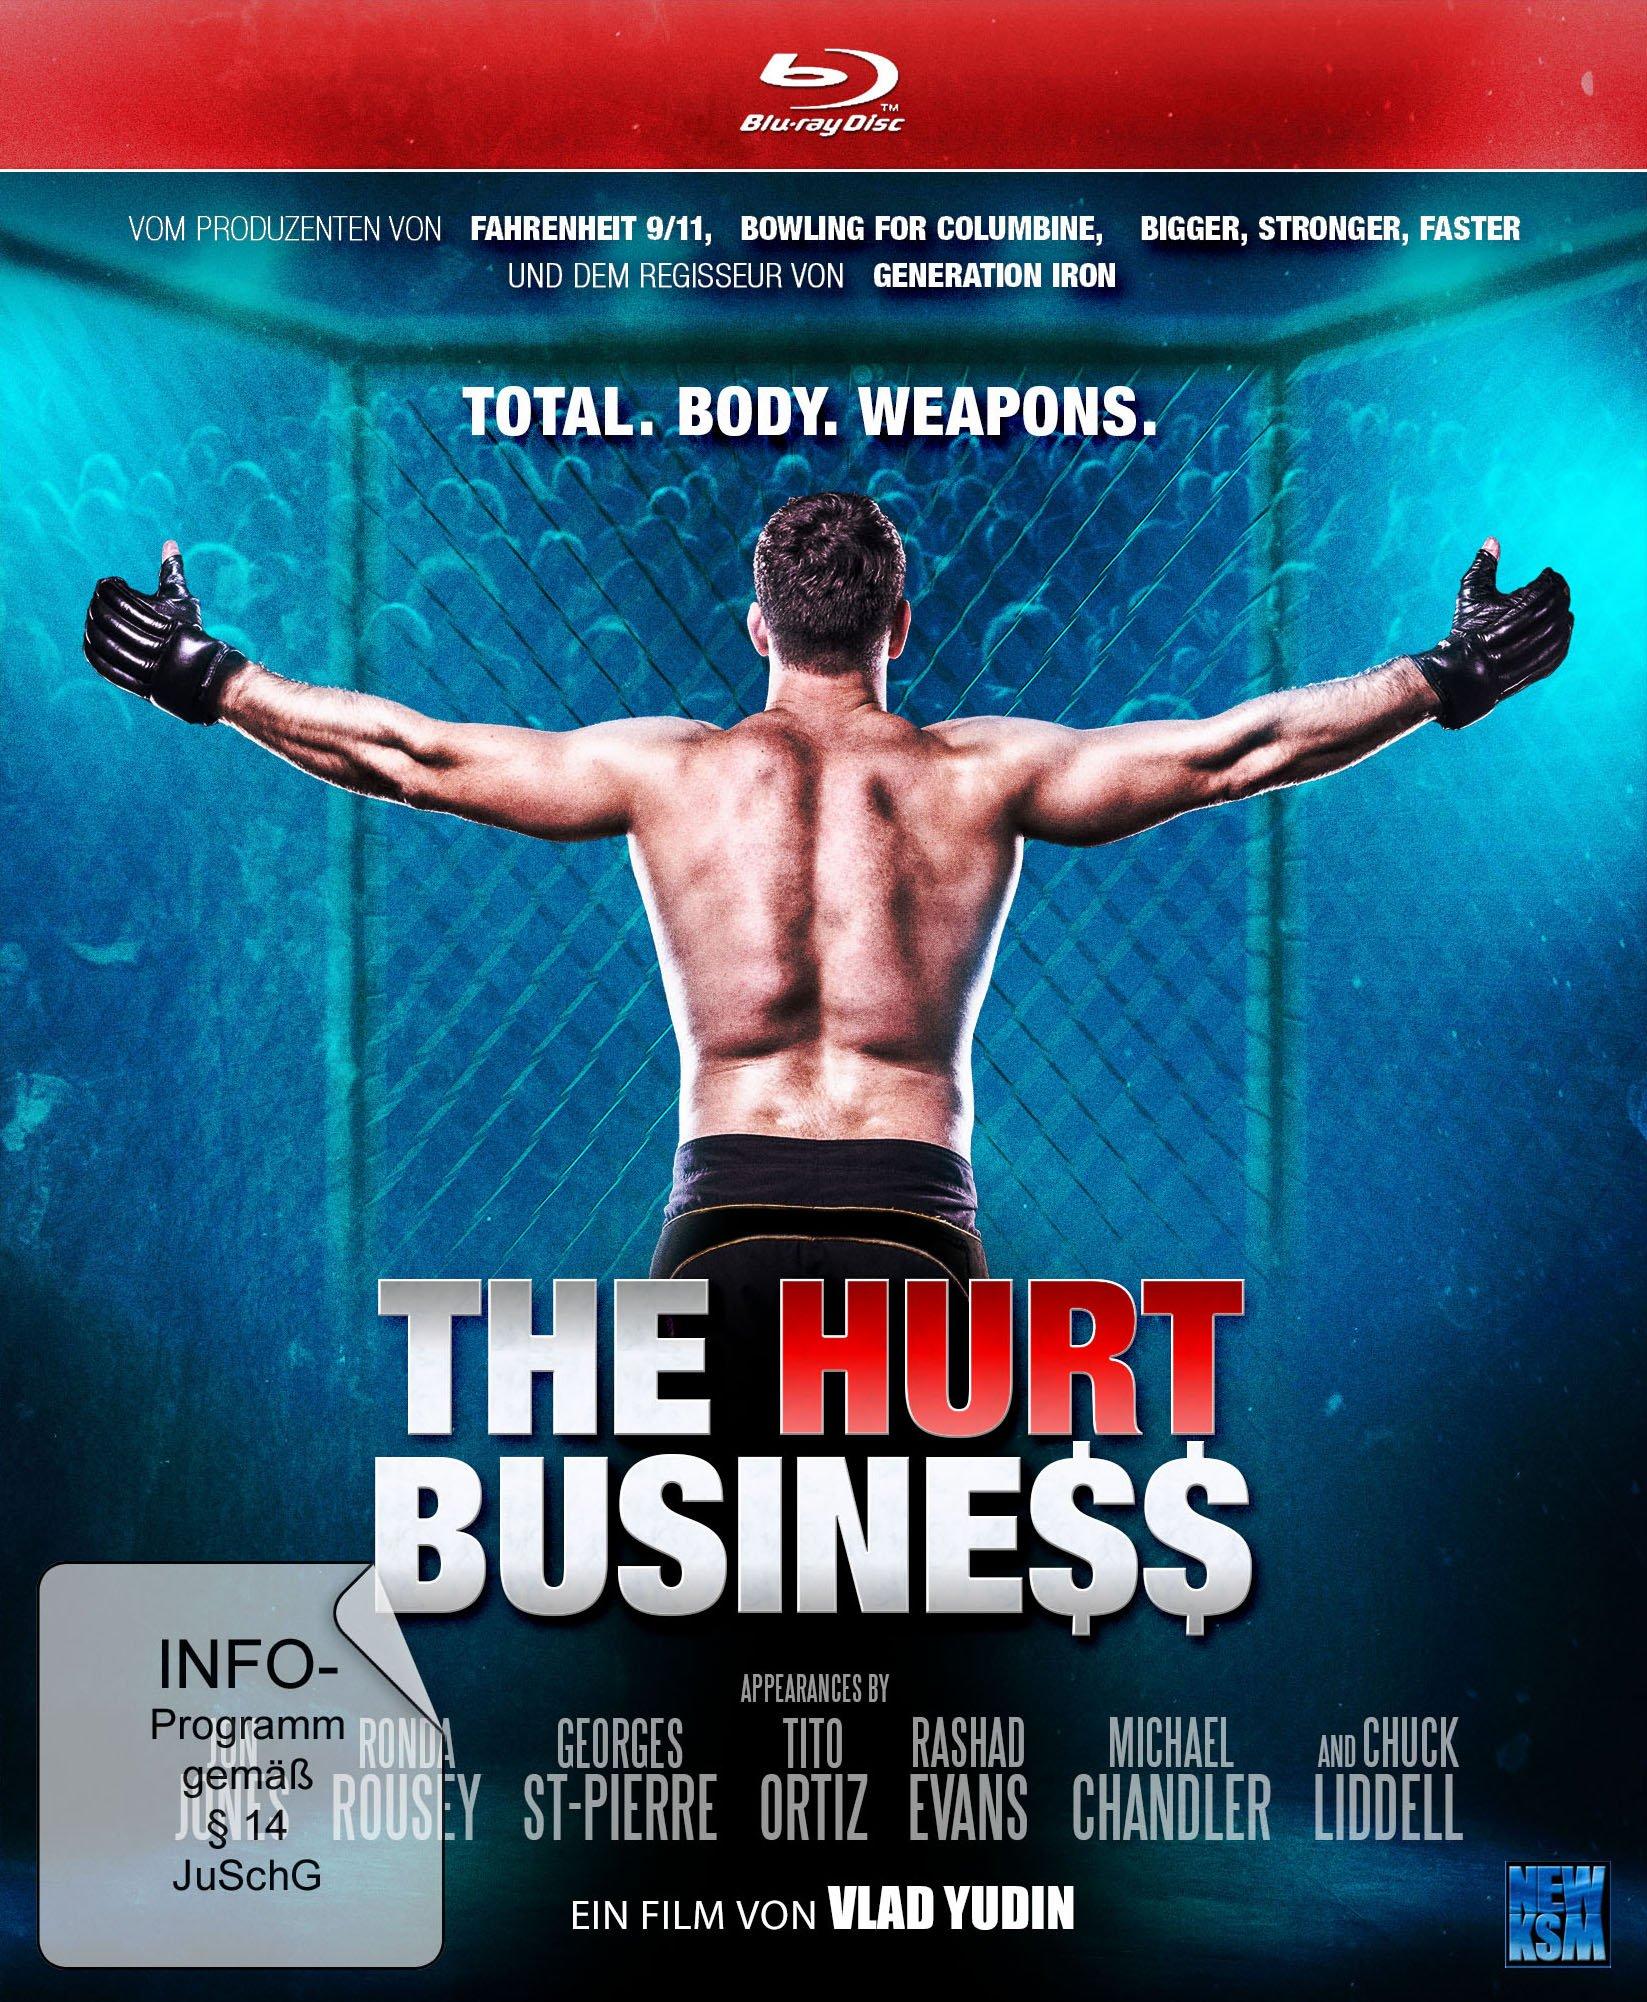 The Hurt Business 2016 German dl Doku BluRay 720p x264 MiLW